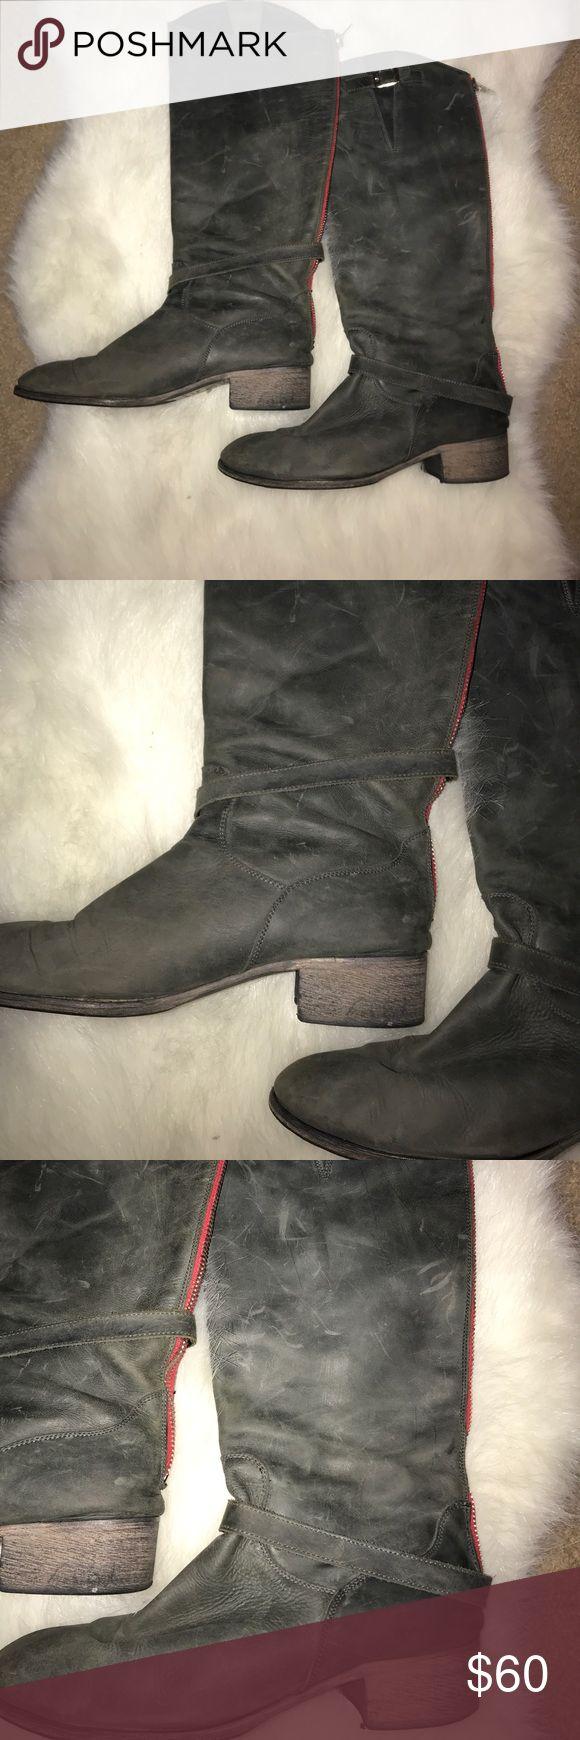 Distressed Charles David gray boot Distressed Charles David gray Boot with red zipper detail Charles David Shoes Combat & Moto Boots